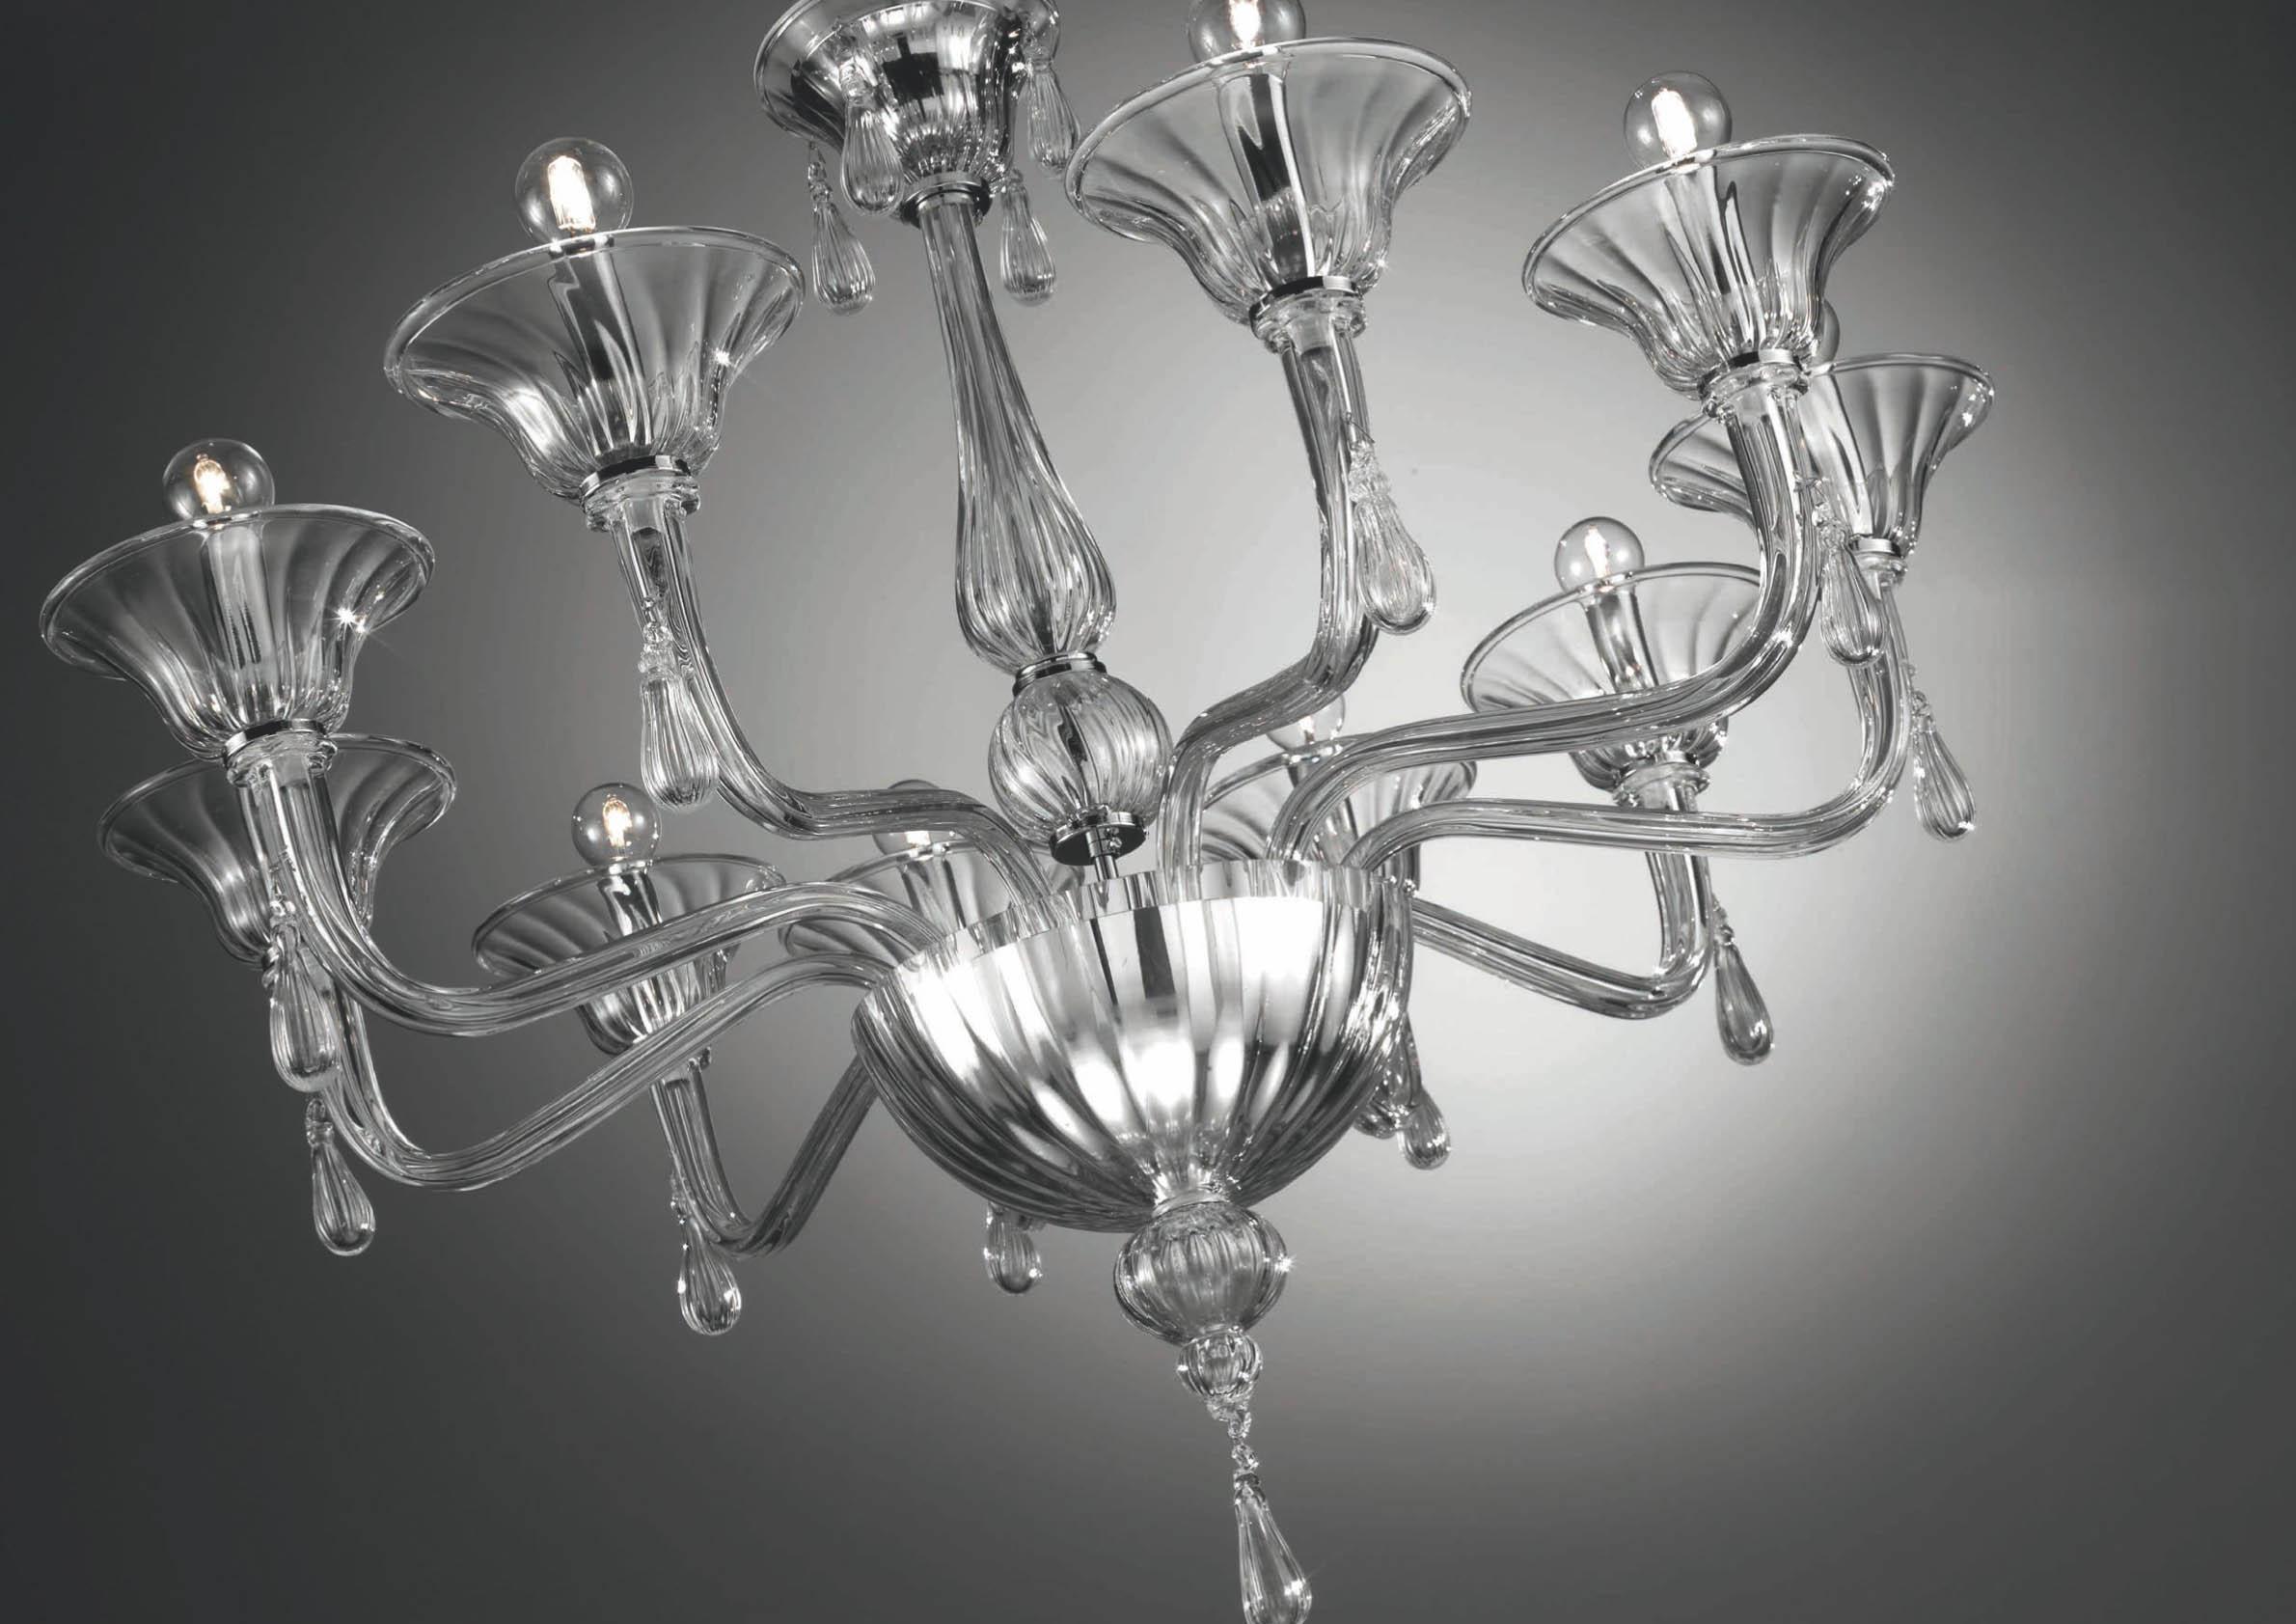 Lampadari murano moderni prezzi lampadari mondo convenienza